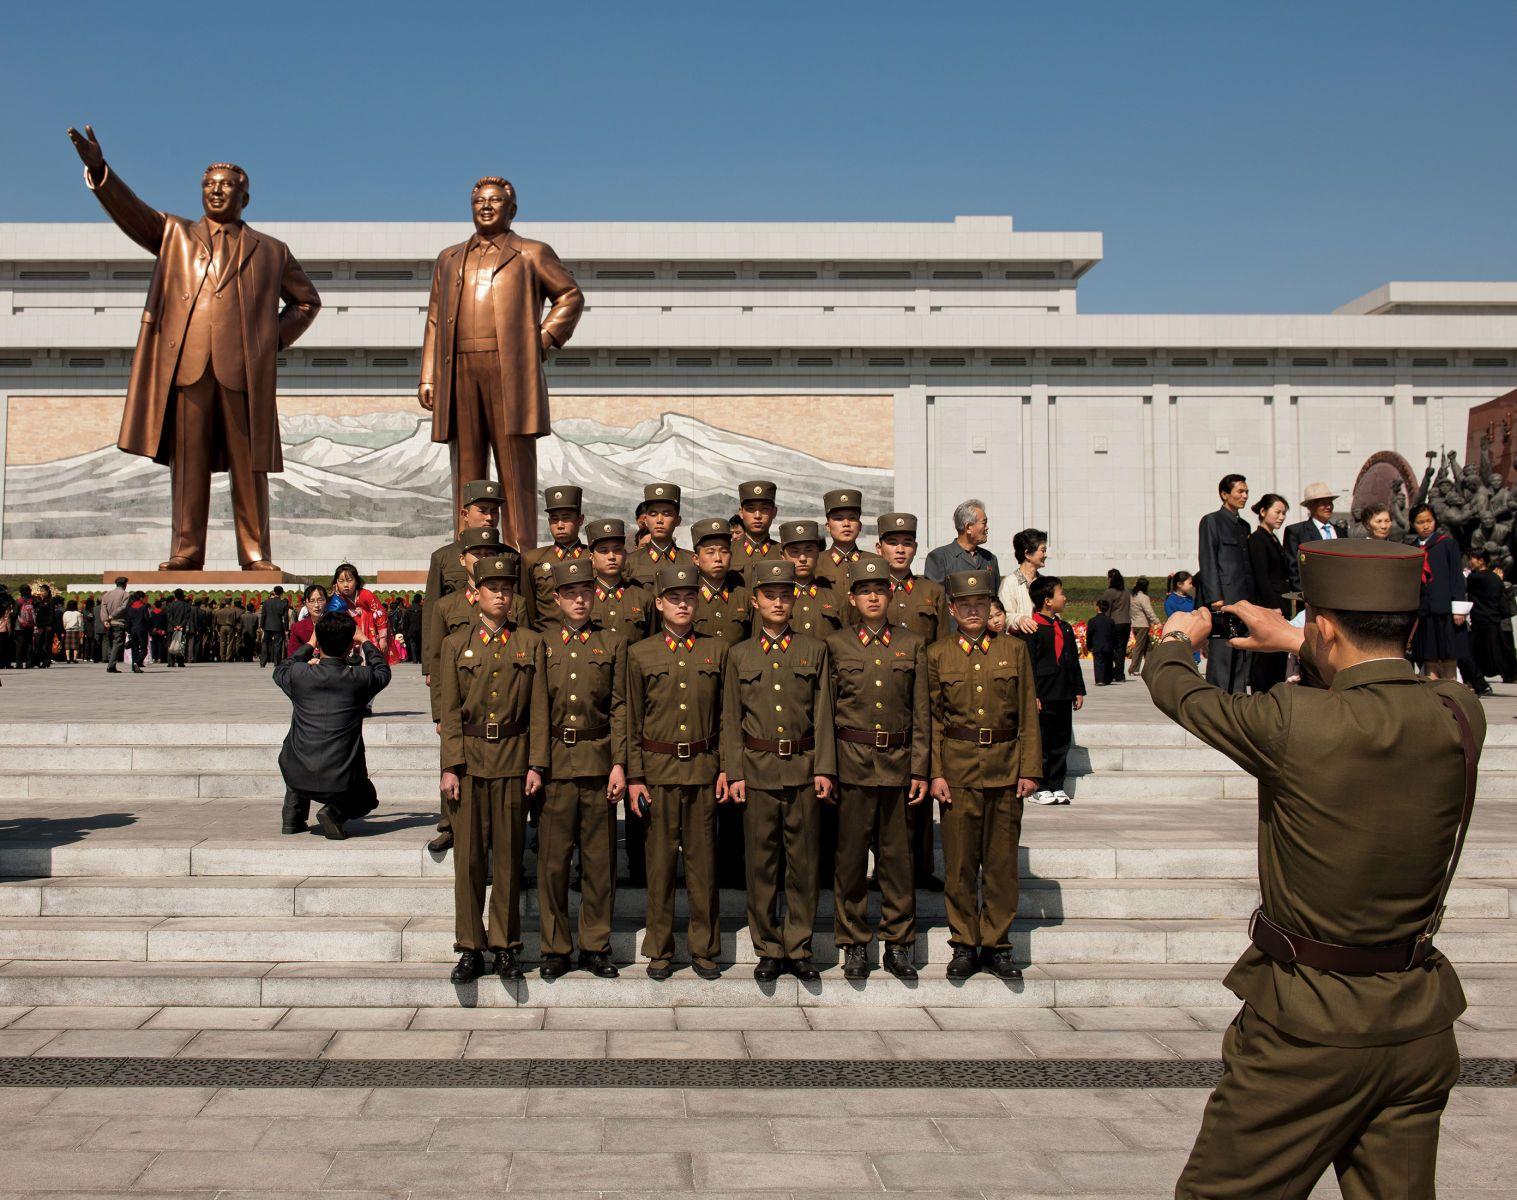 1dprk_pyongyang_3457.jpg